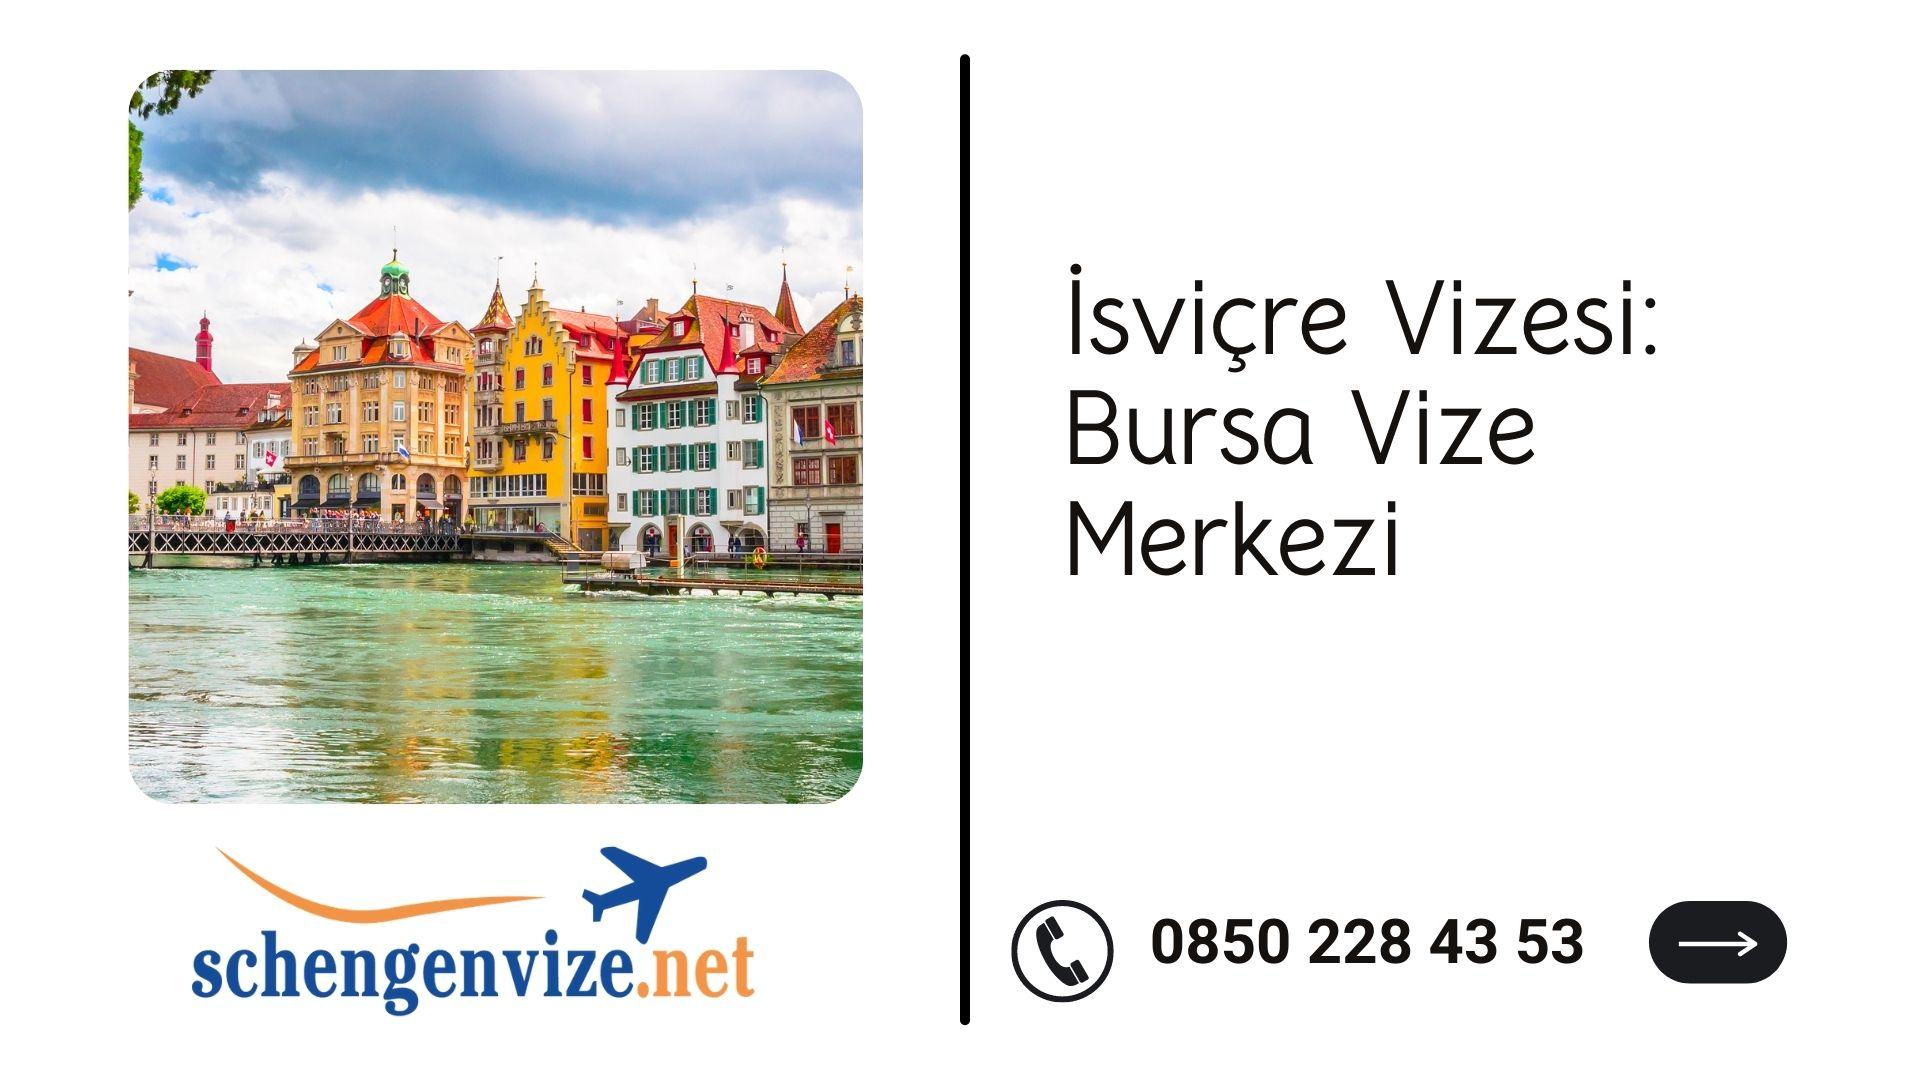 İsviçre Vizesi: Bursa Vize Merkezi